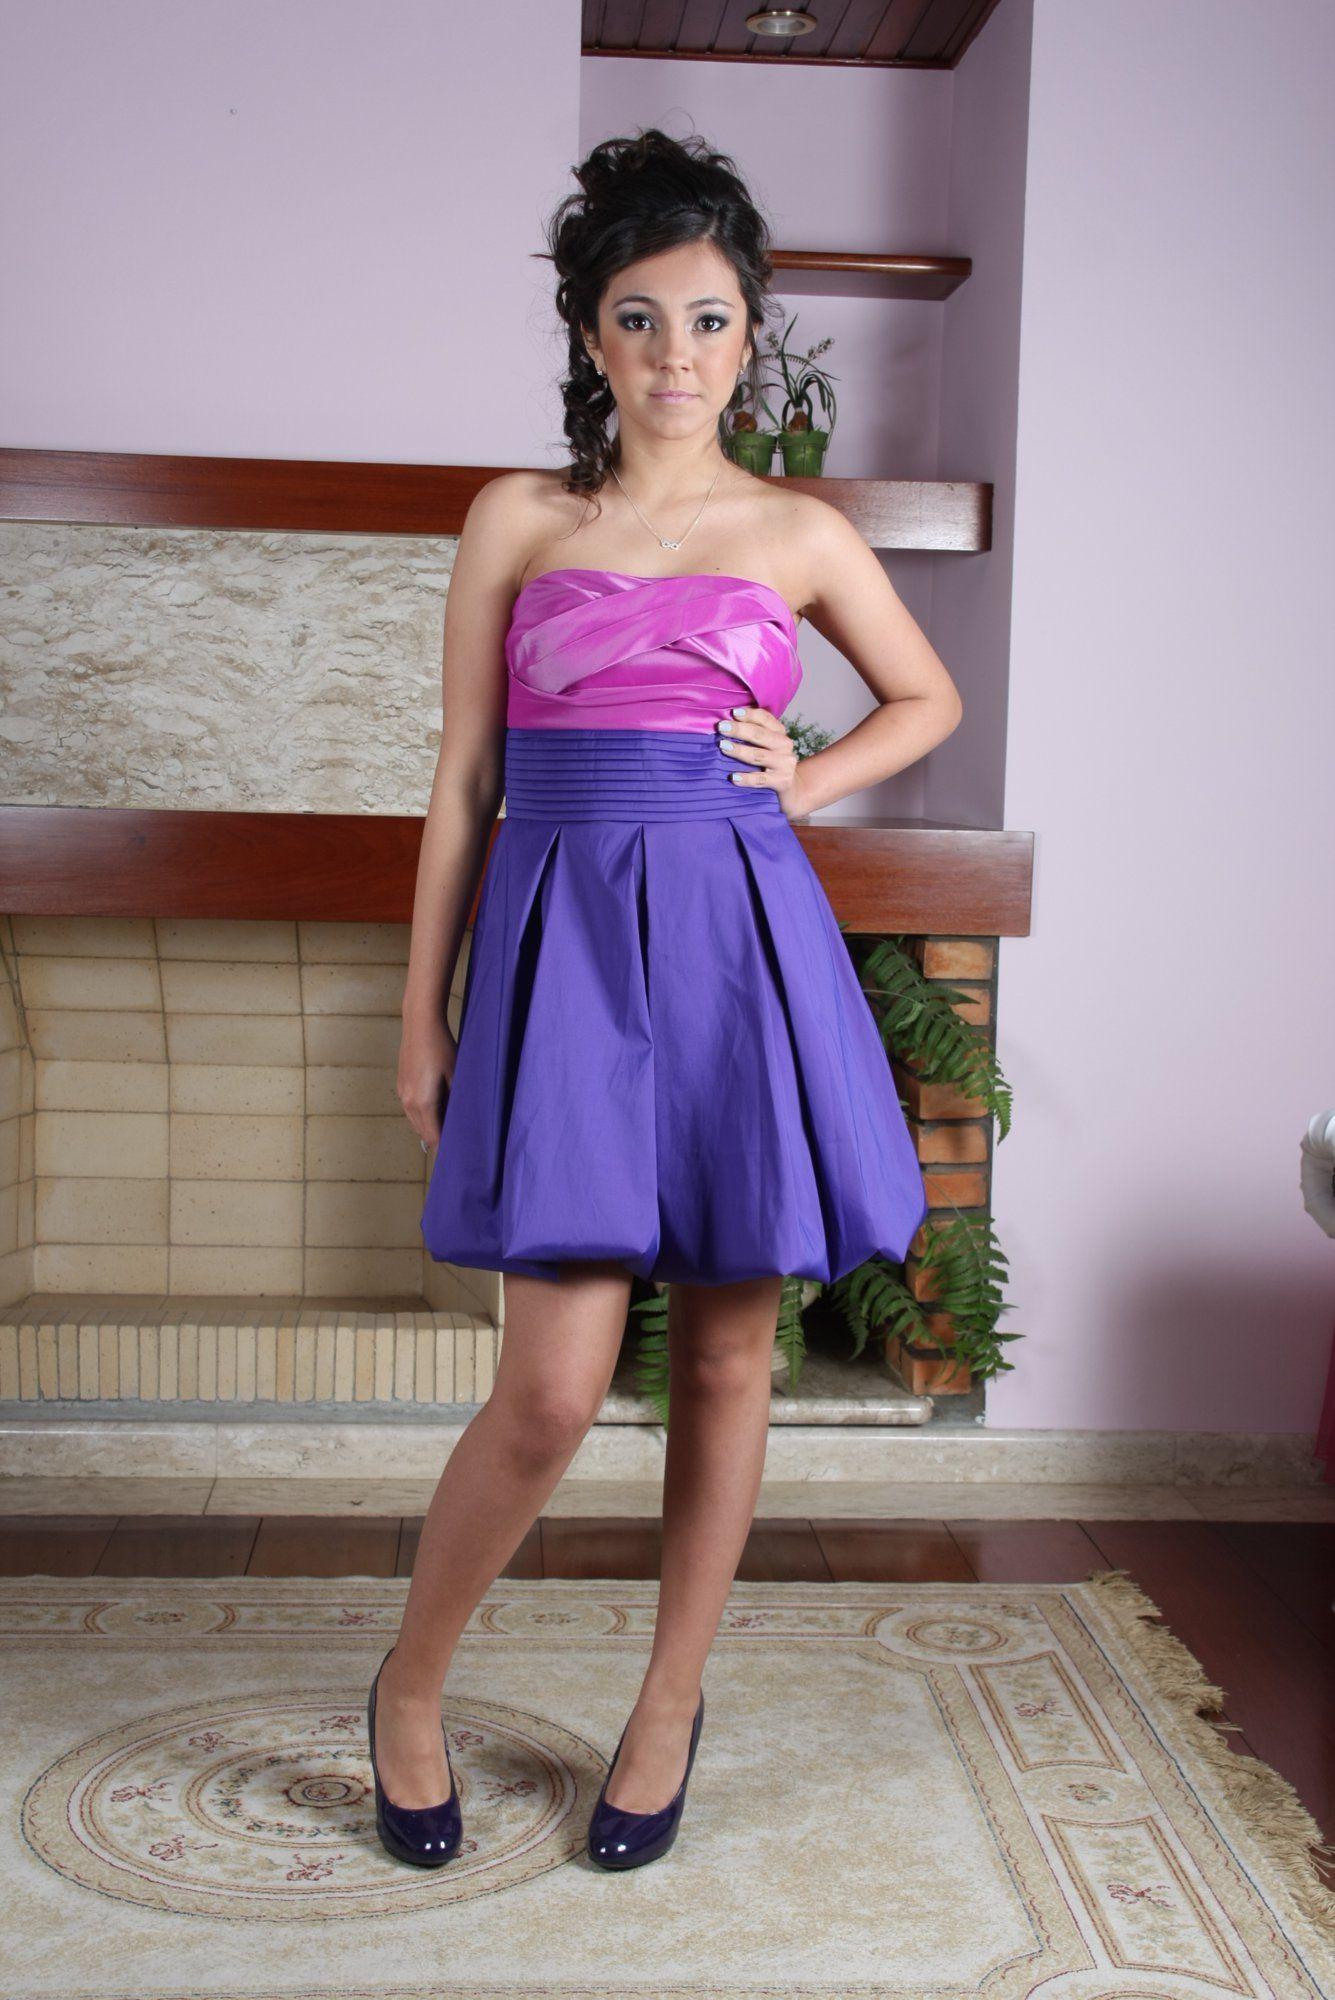 Vestido de Debutante Lilas - 1 - Hipnose Alta Costura e Spa para Noivas e Noivos - Campinas - SP Vestido de Debutante, Vestido de Debutante Lilas, Hipnose Alta Costura